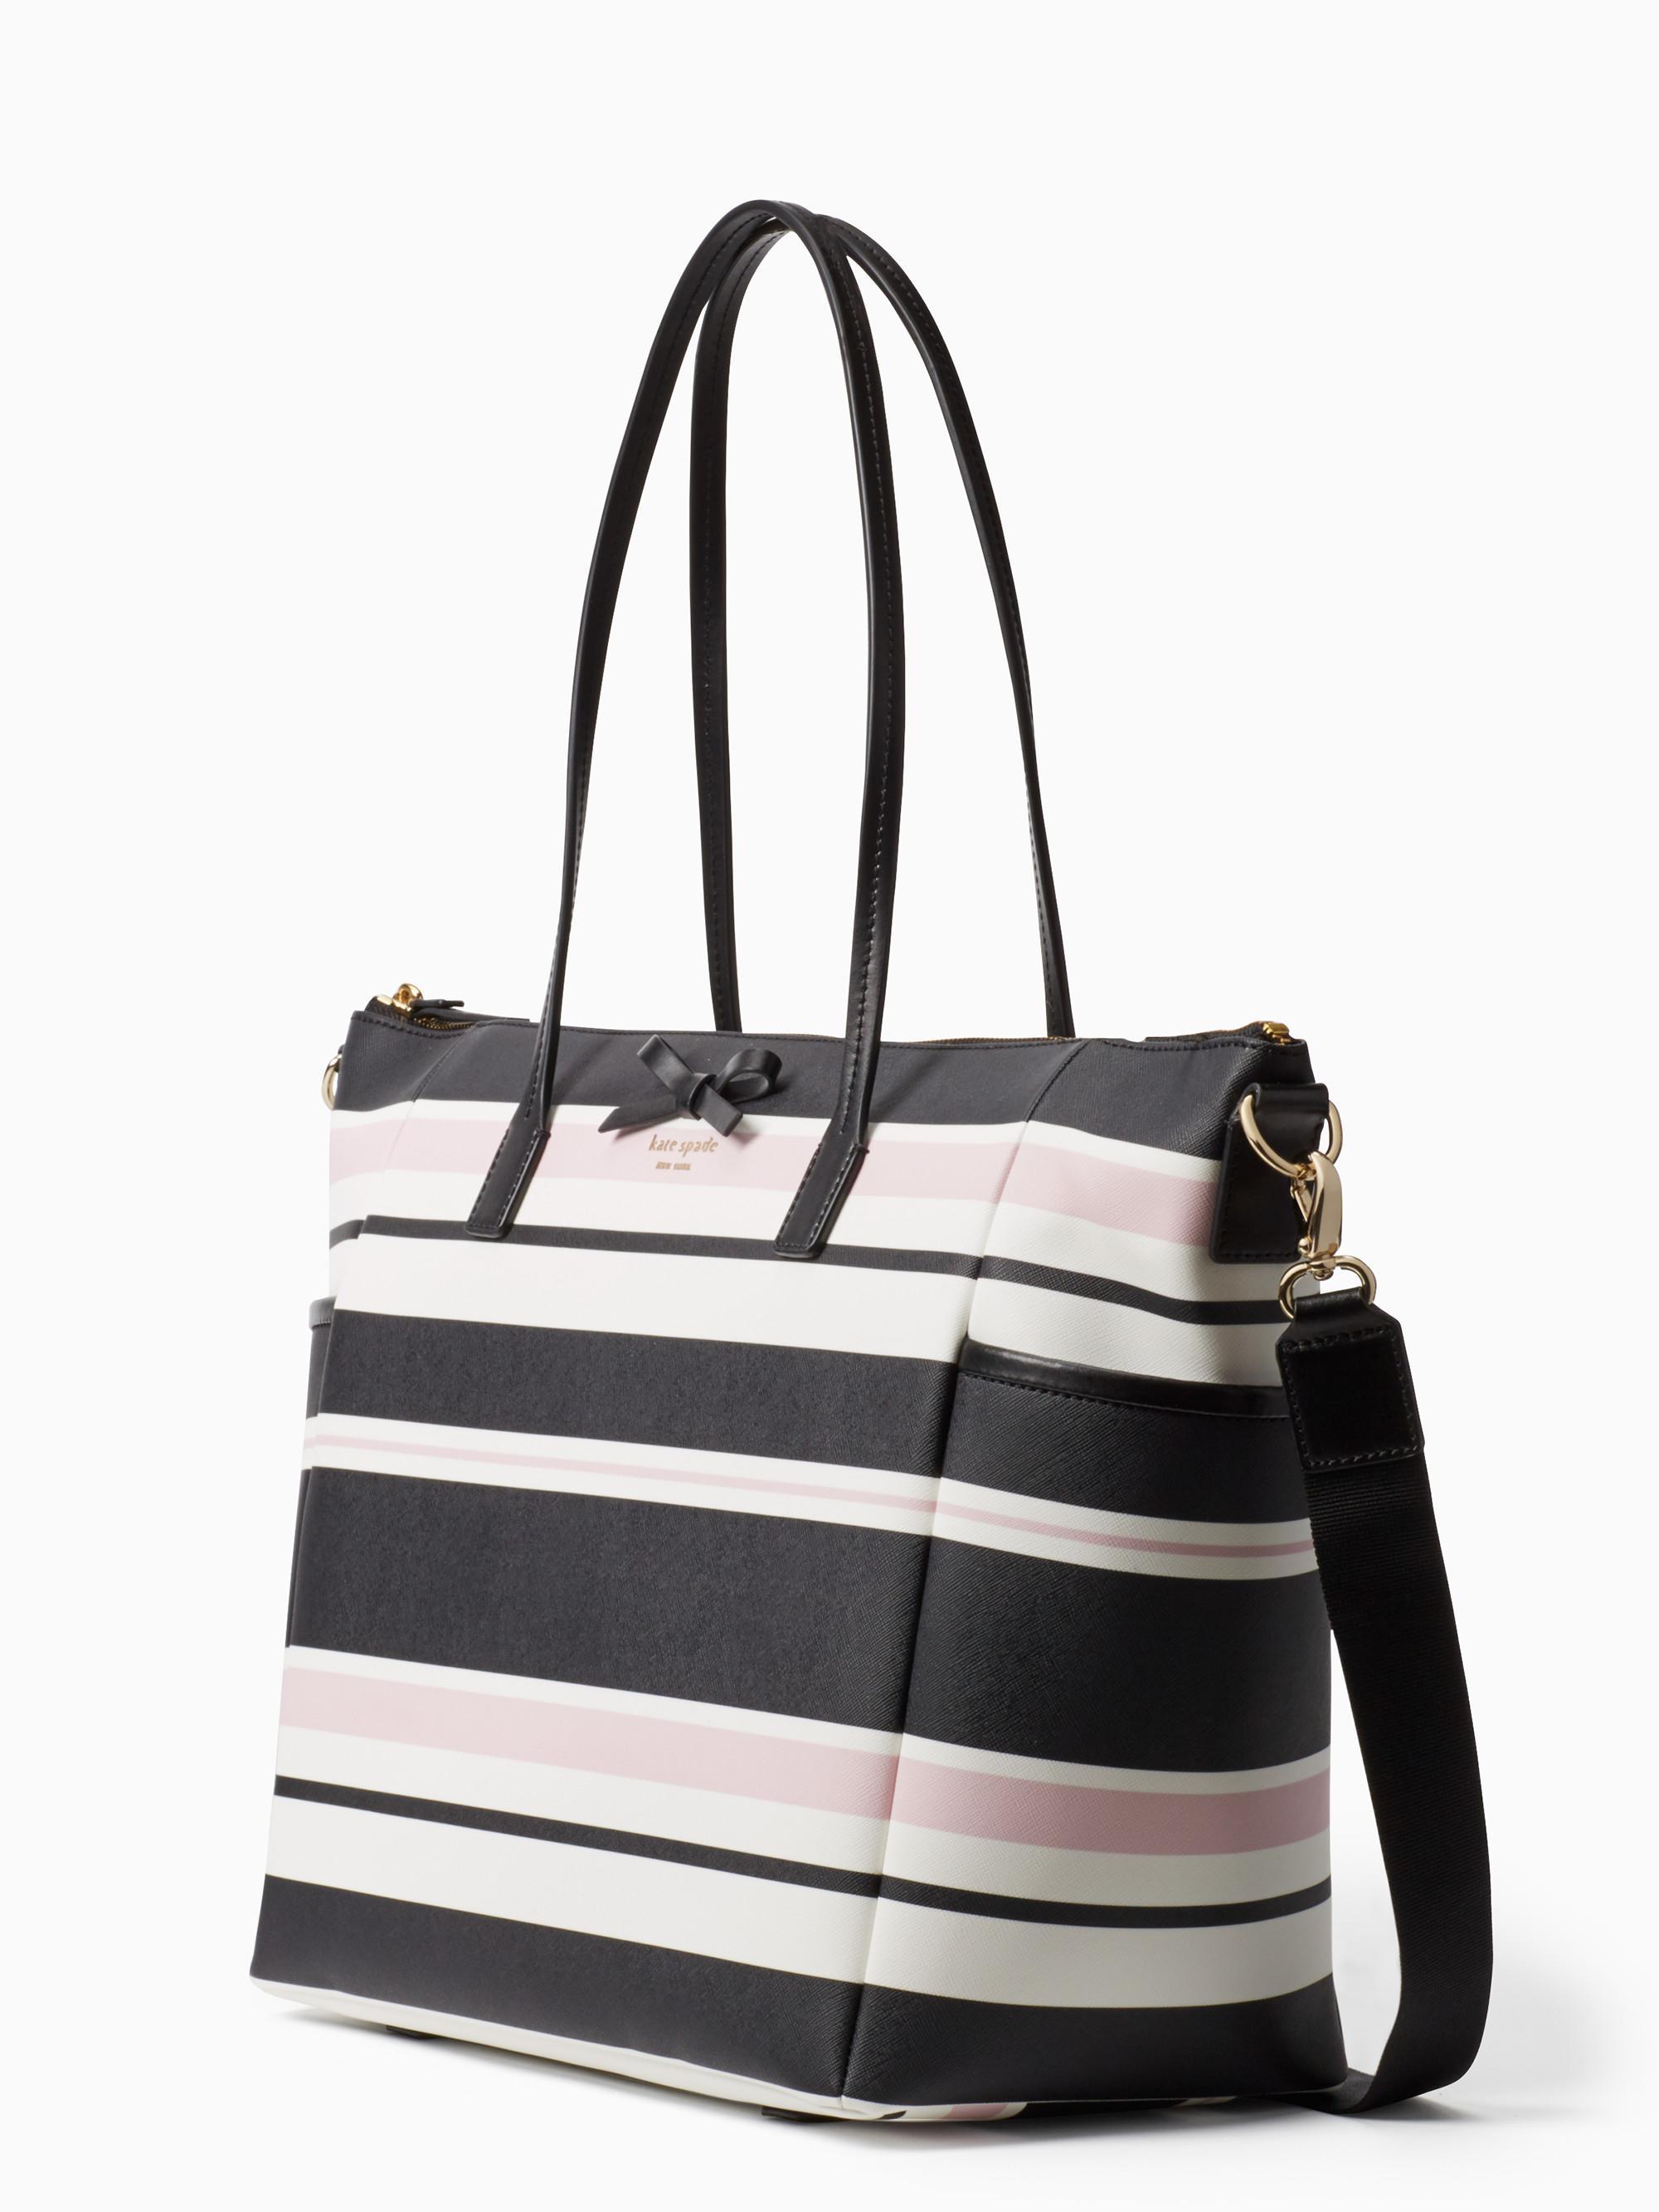 5ab9ccdb0b56 Lyst - Kate Spade Eden Street Adaira Baby Bag in Black